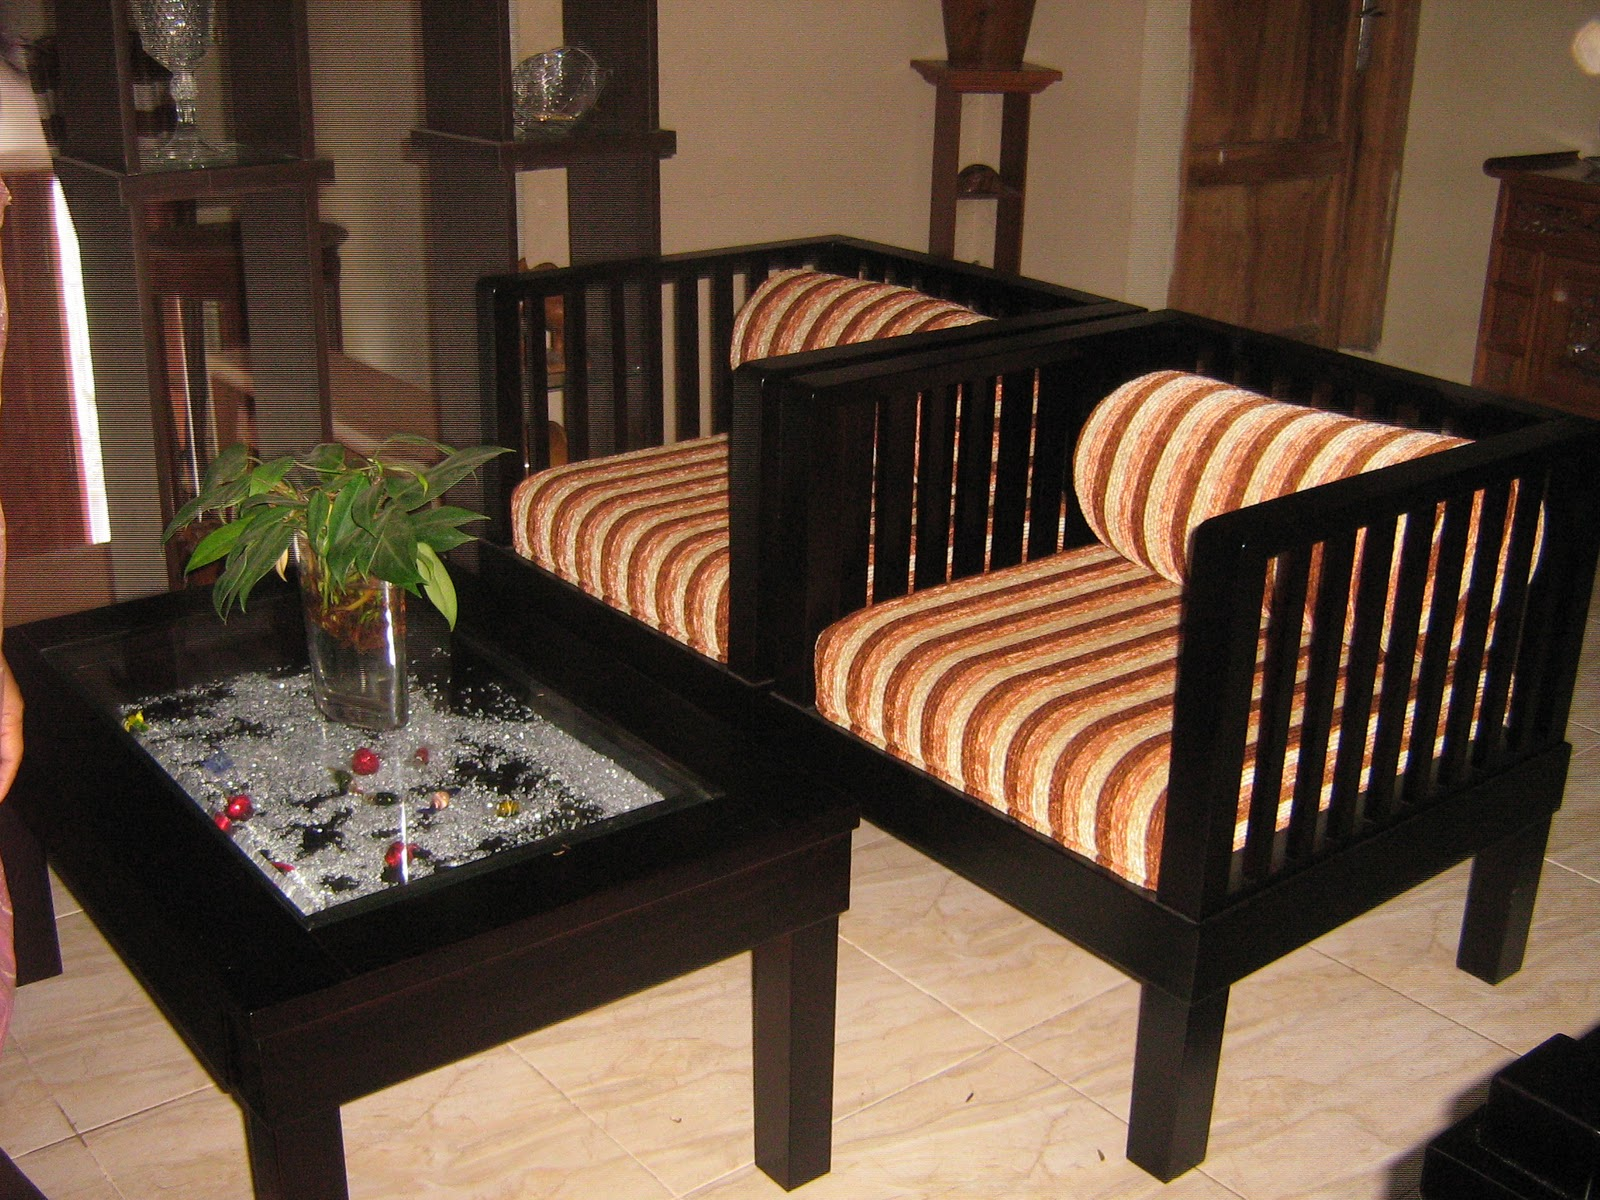 Mebel Furniture Di Bandung Mebel Furniture Di Bandung